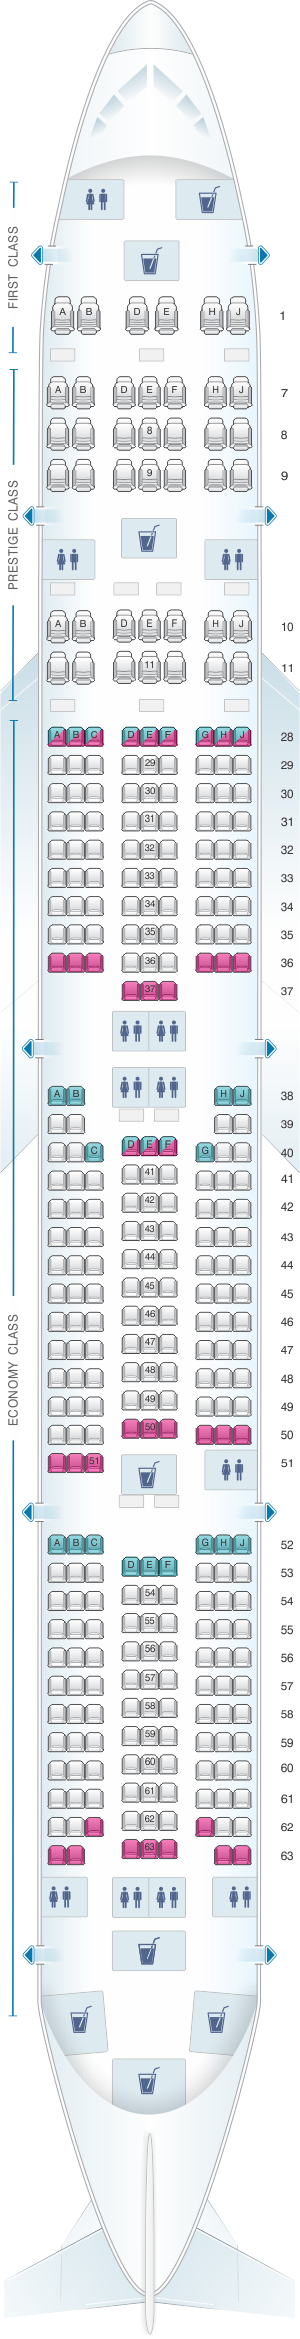 Seat map for Korean Air Boeing B777 300 338PAX